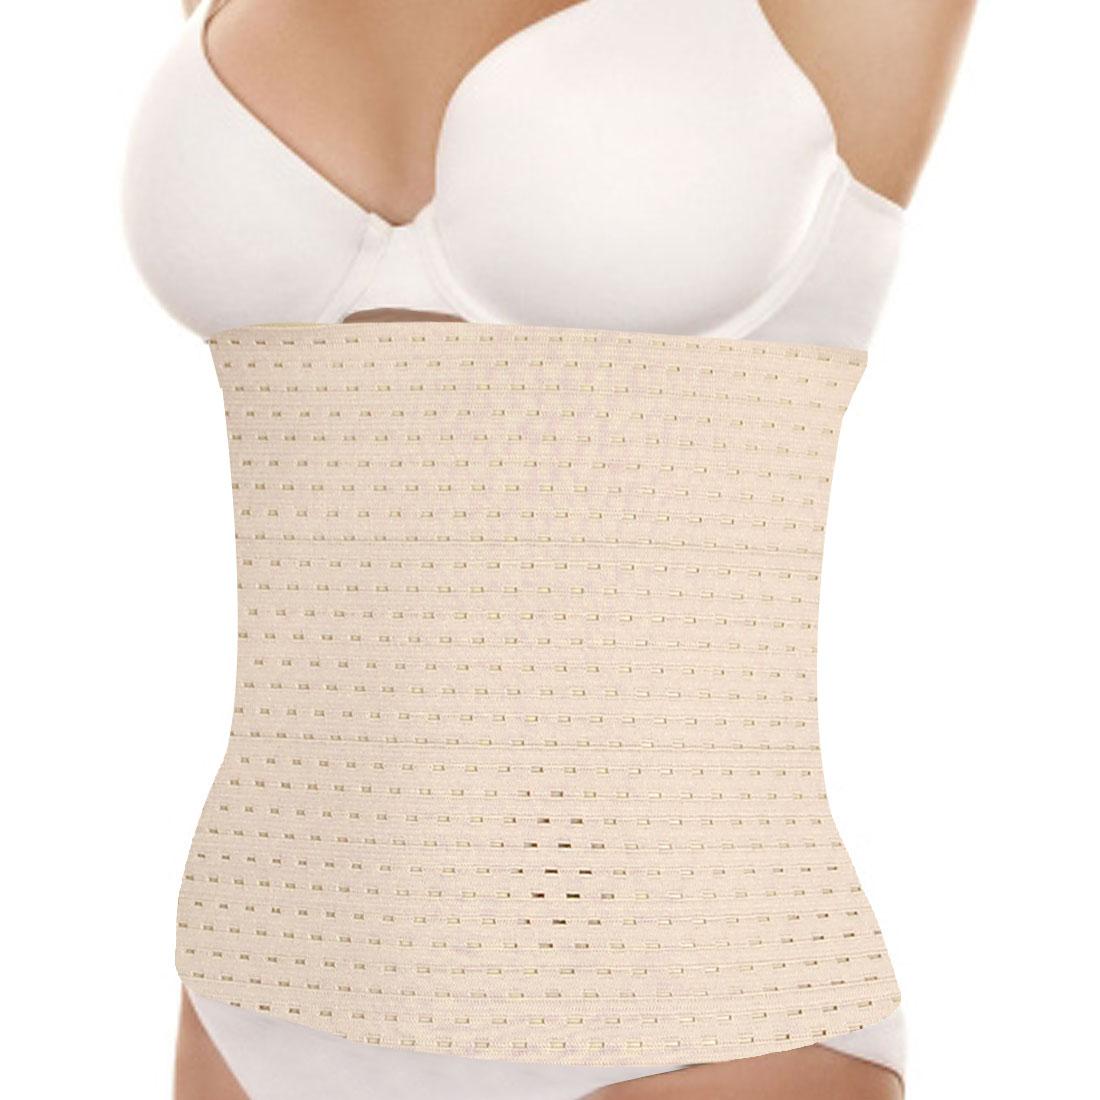 Lady Eye Hook Closure Tummy Cincher Shapewear Wrap Off White S